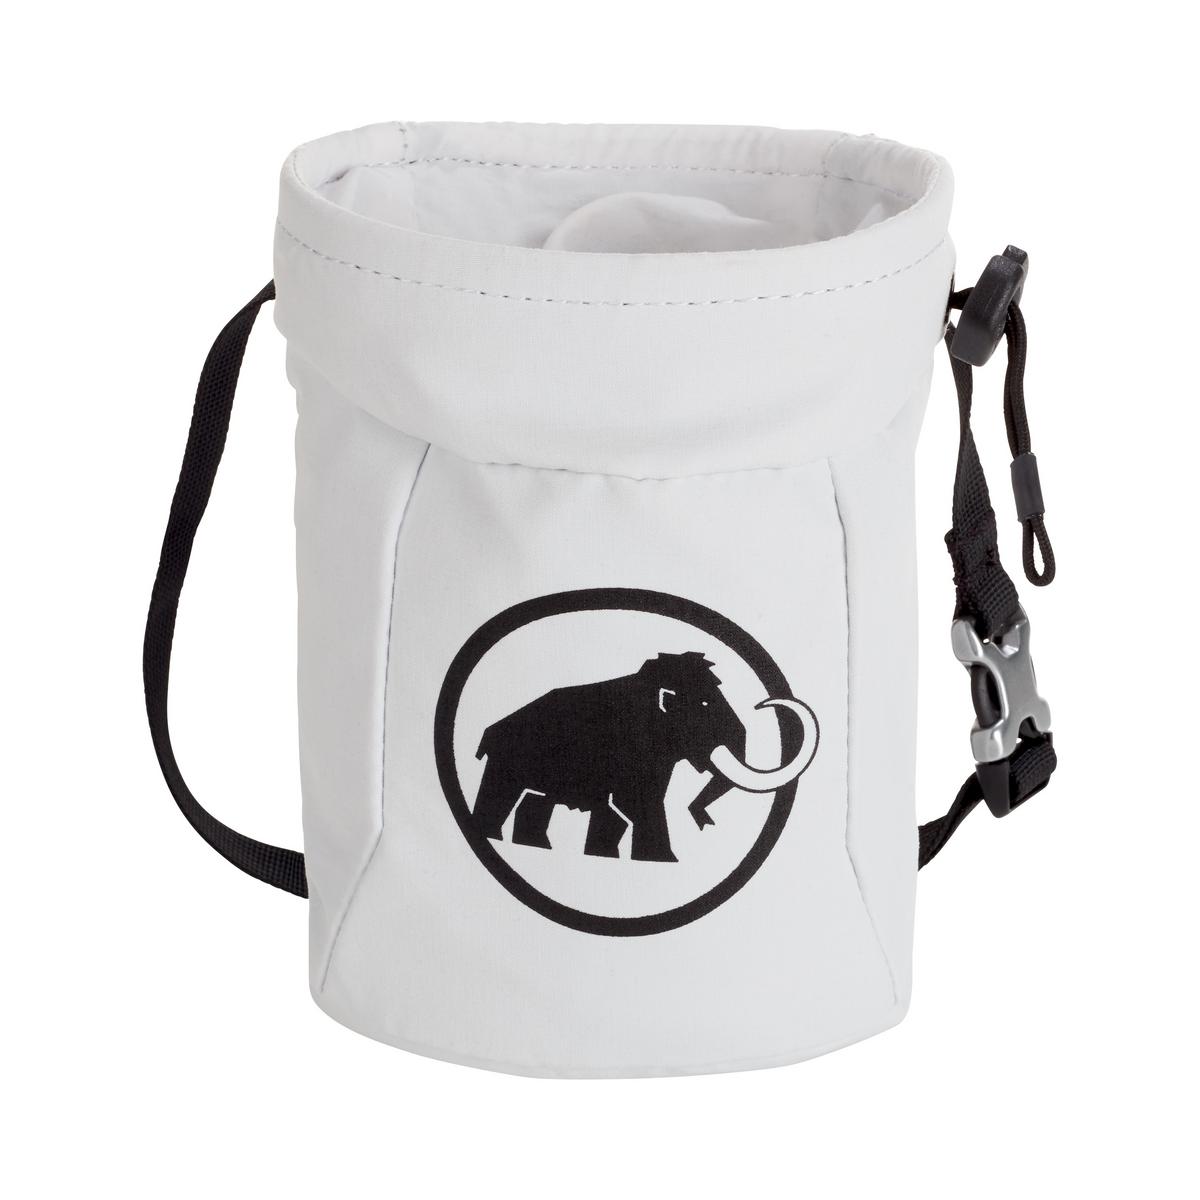 Mammut Togir Chalk Bag Chalk Bag